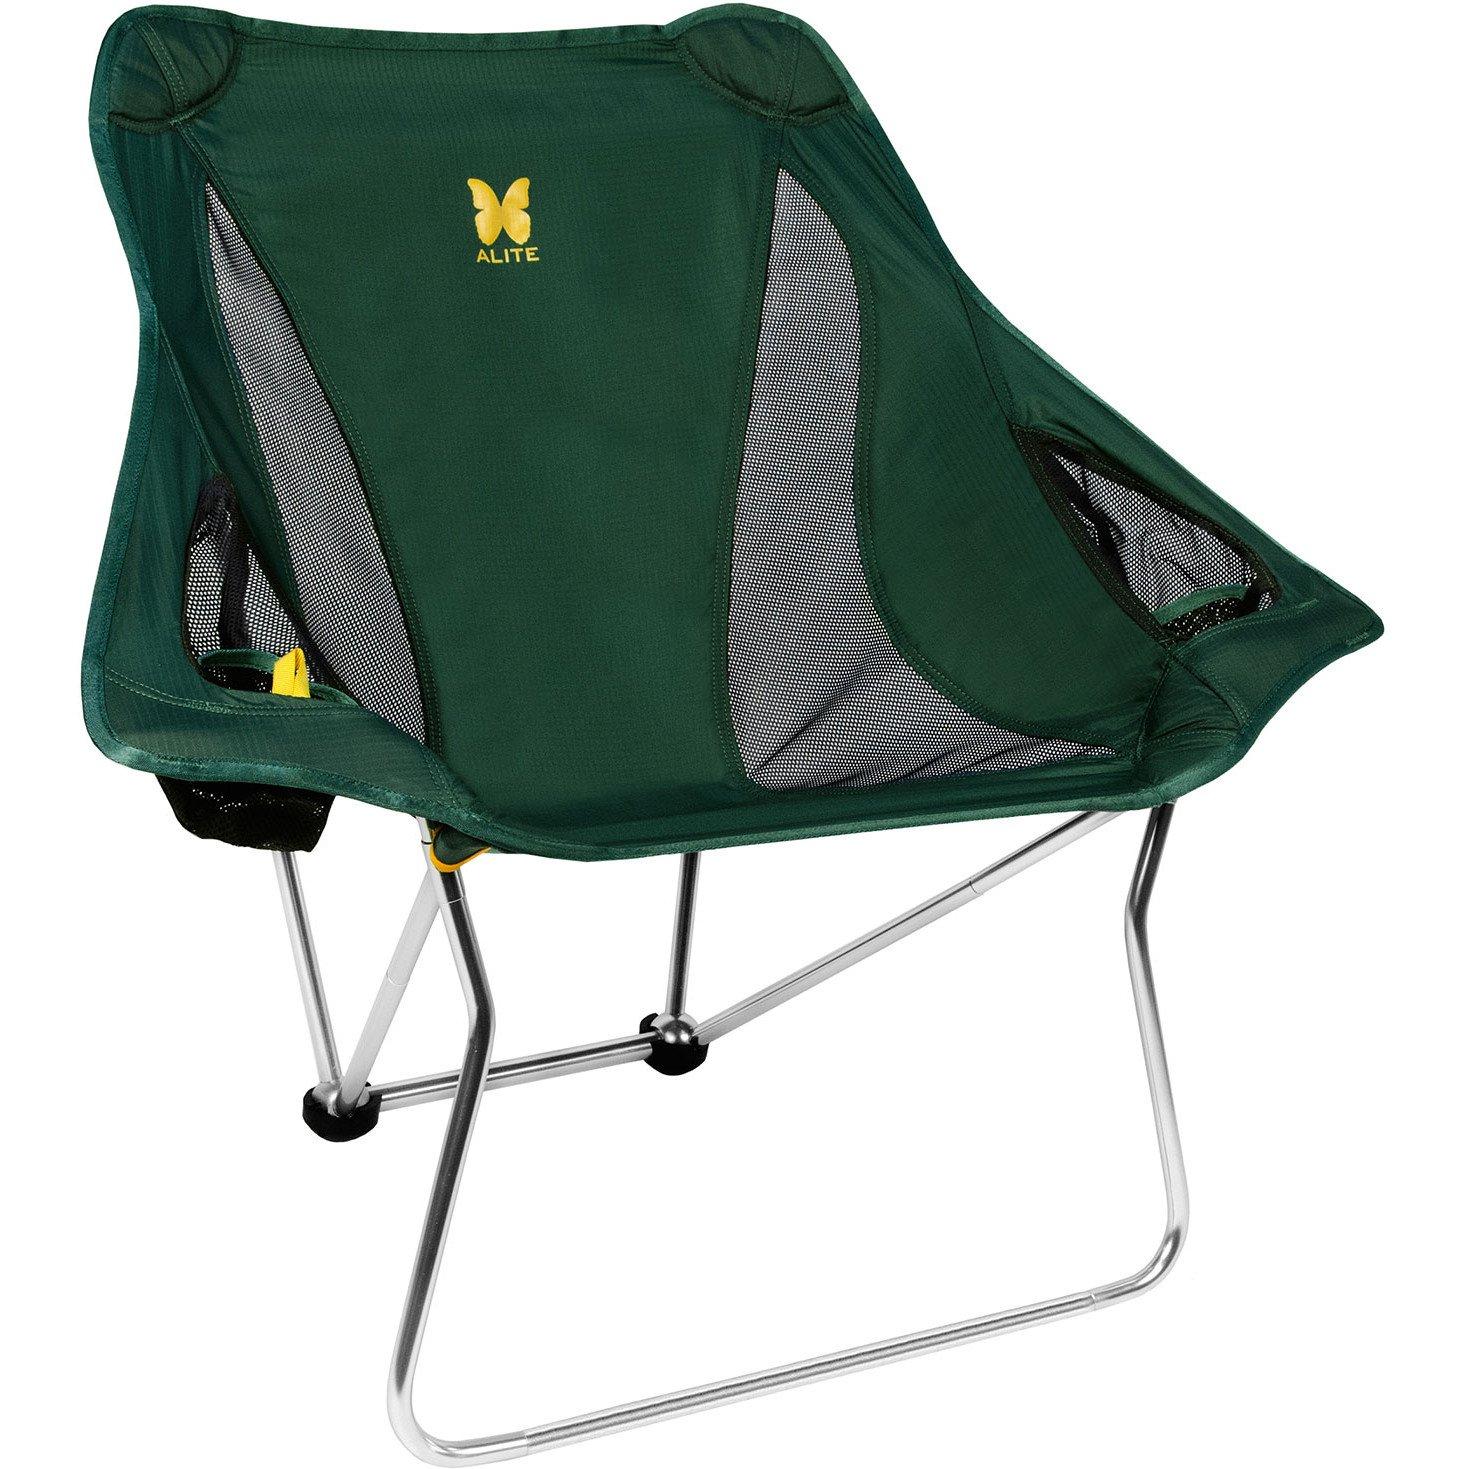 Alite Stoneflyキャンプ椅子1つサイズSutroグリーン B07CFQLY74